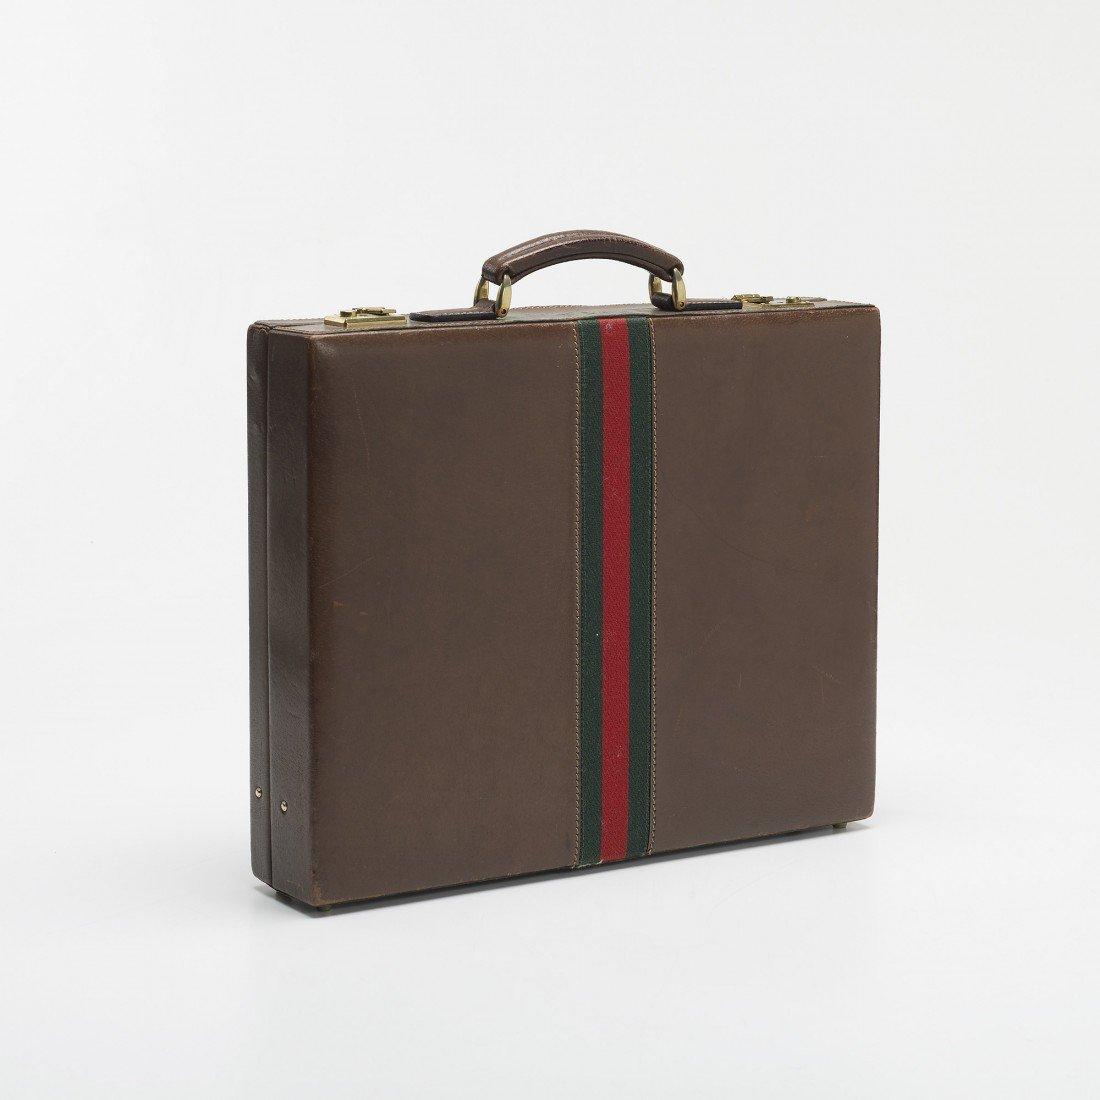 242: Gucci briefcase